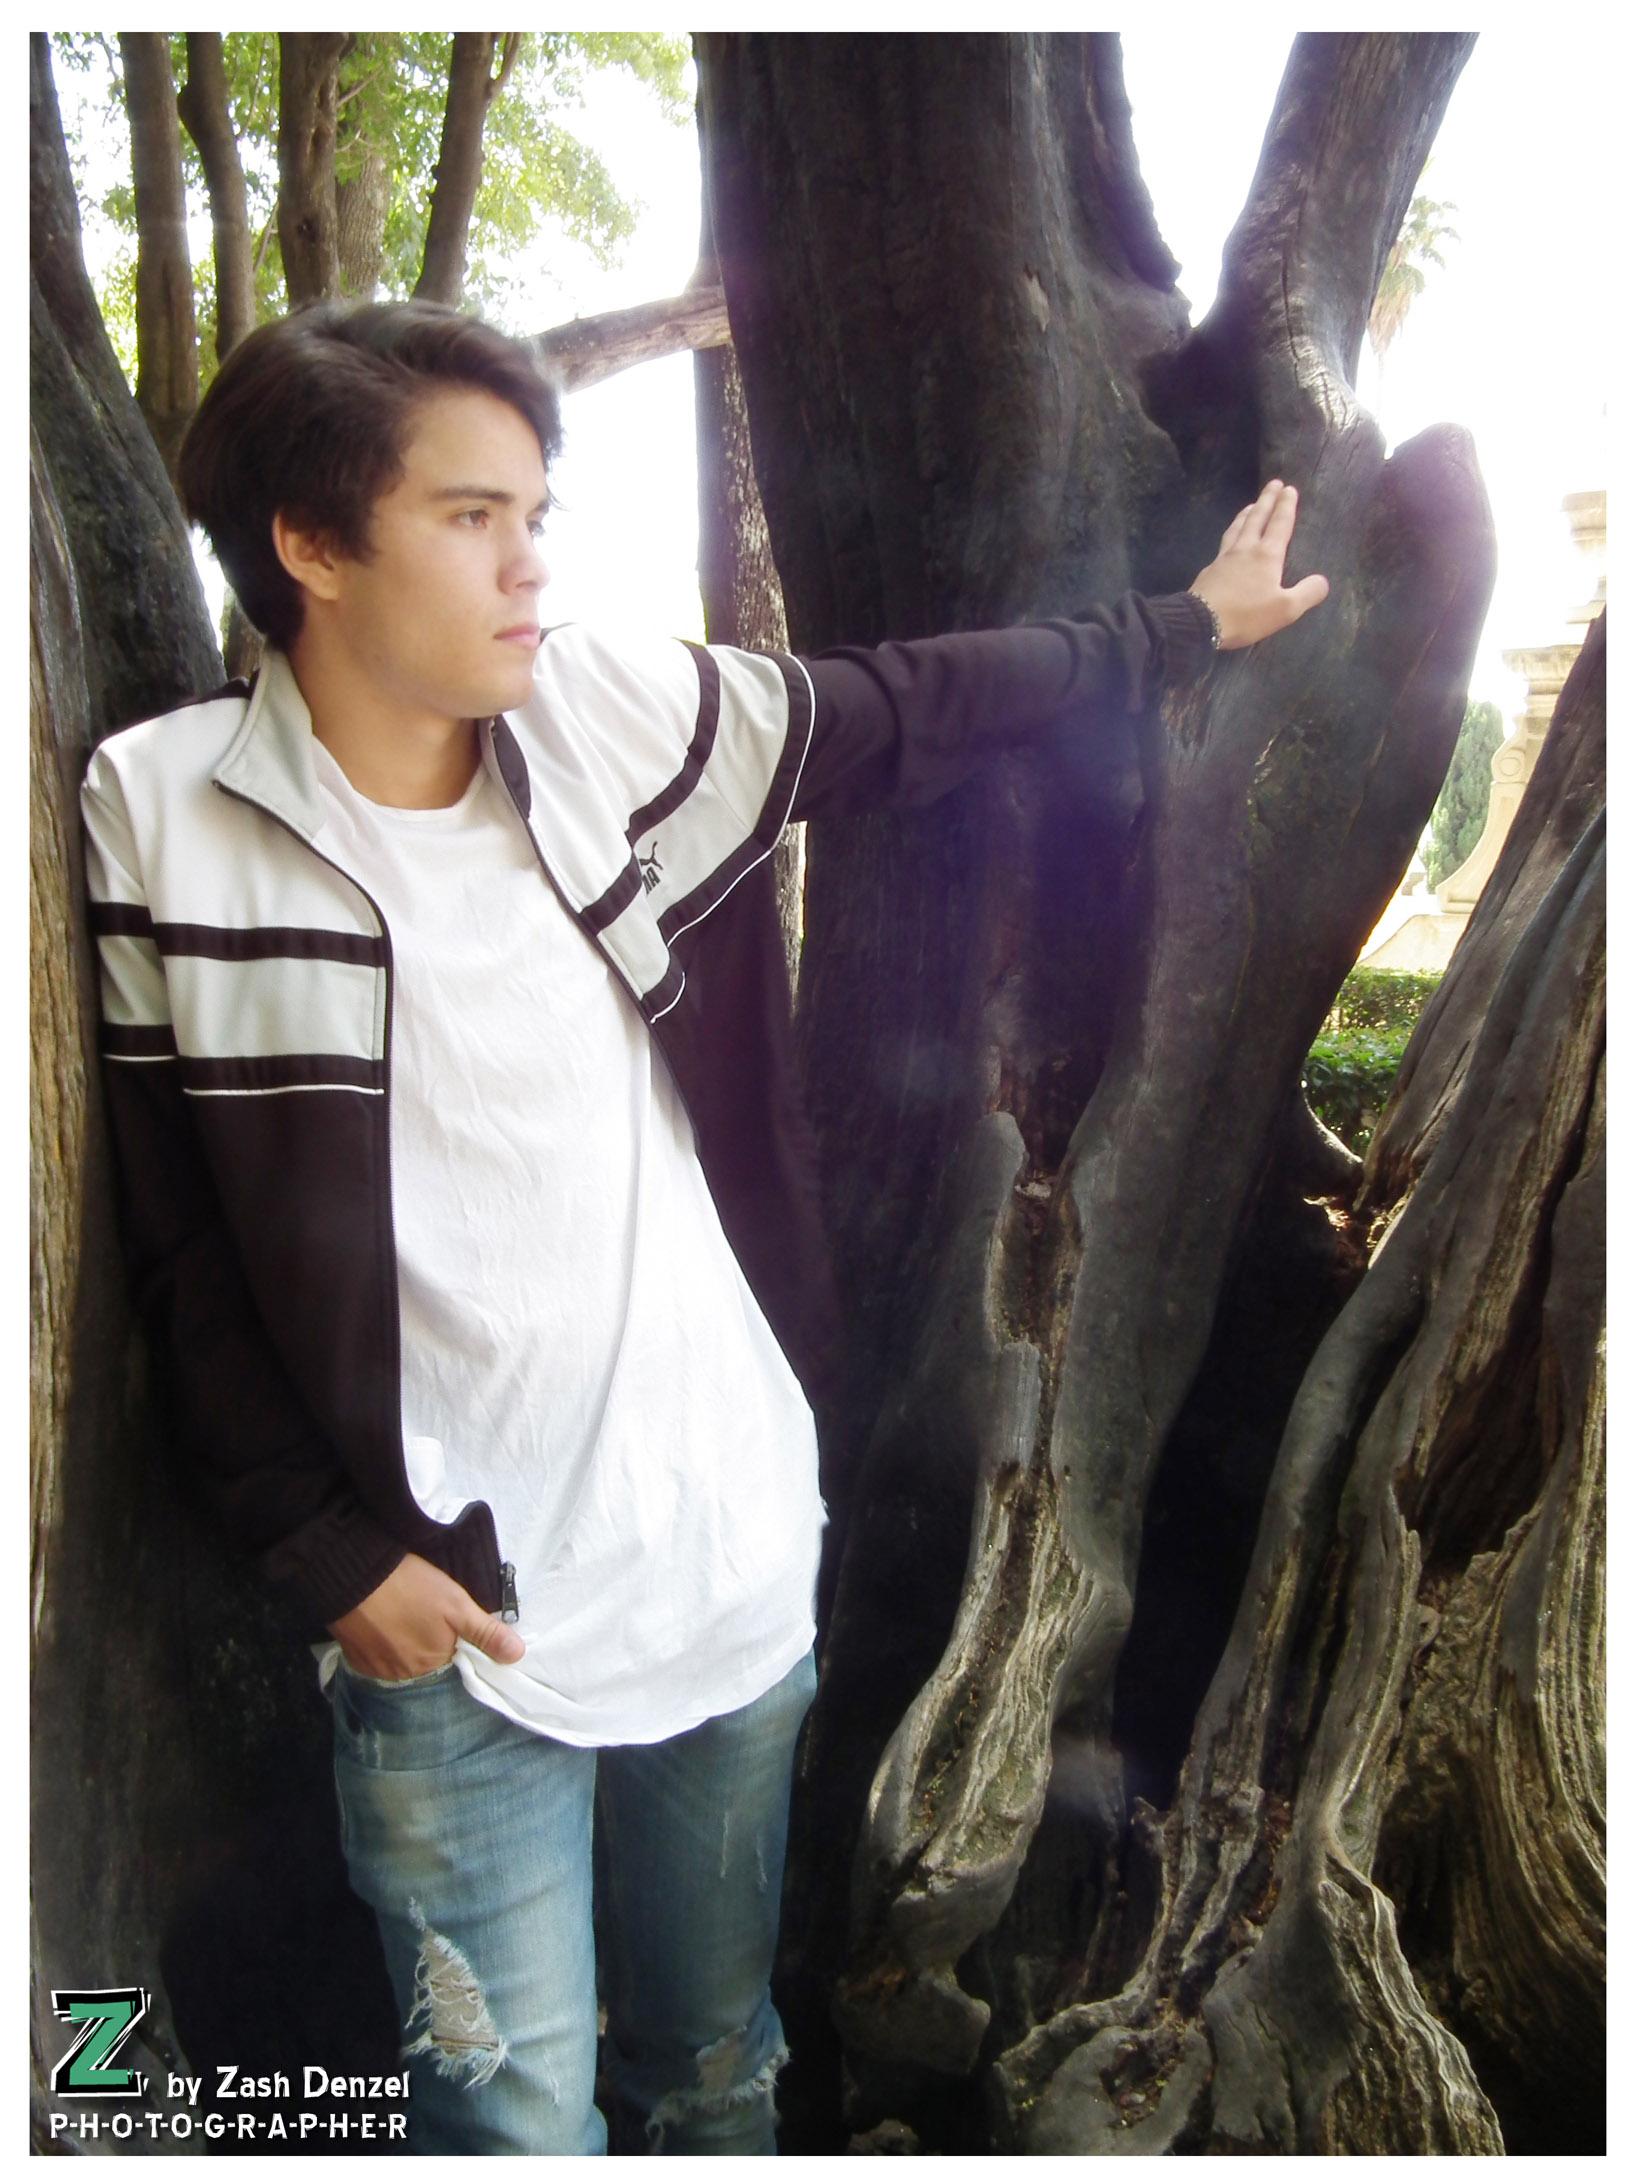 Model: Luis Morato 8